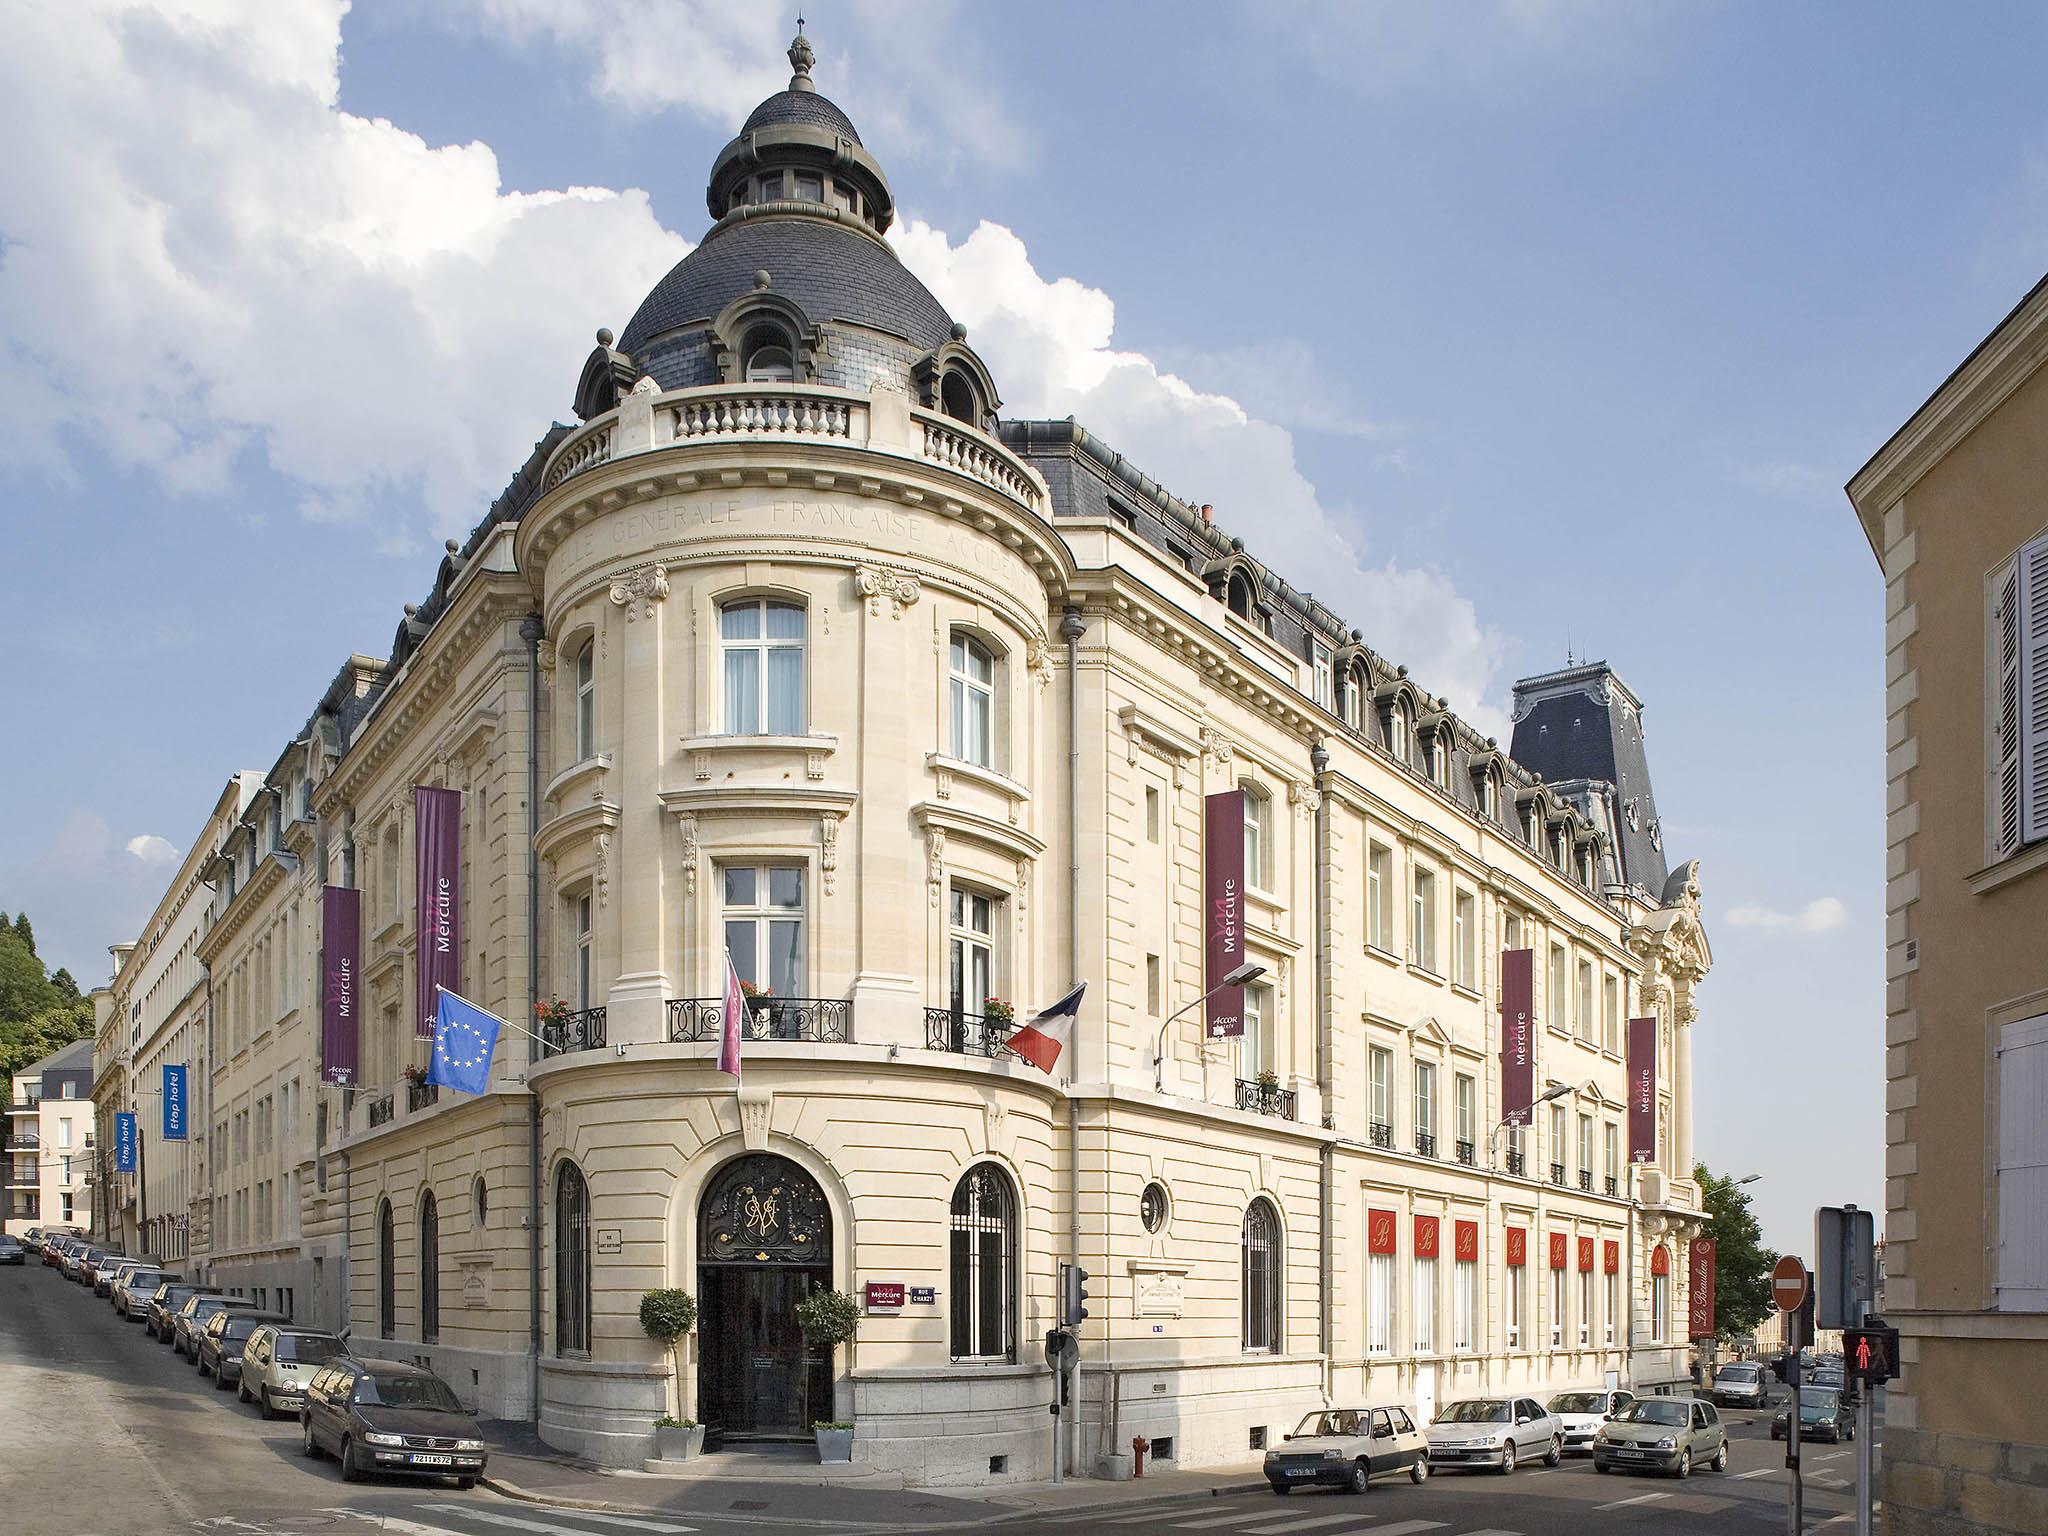 Hotel – Hotel Mercure Le Mans Centro